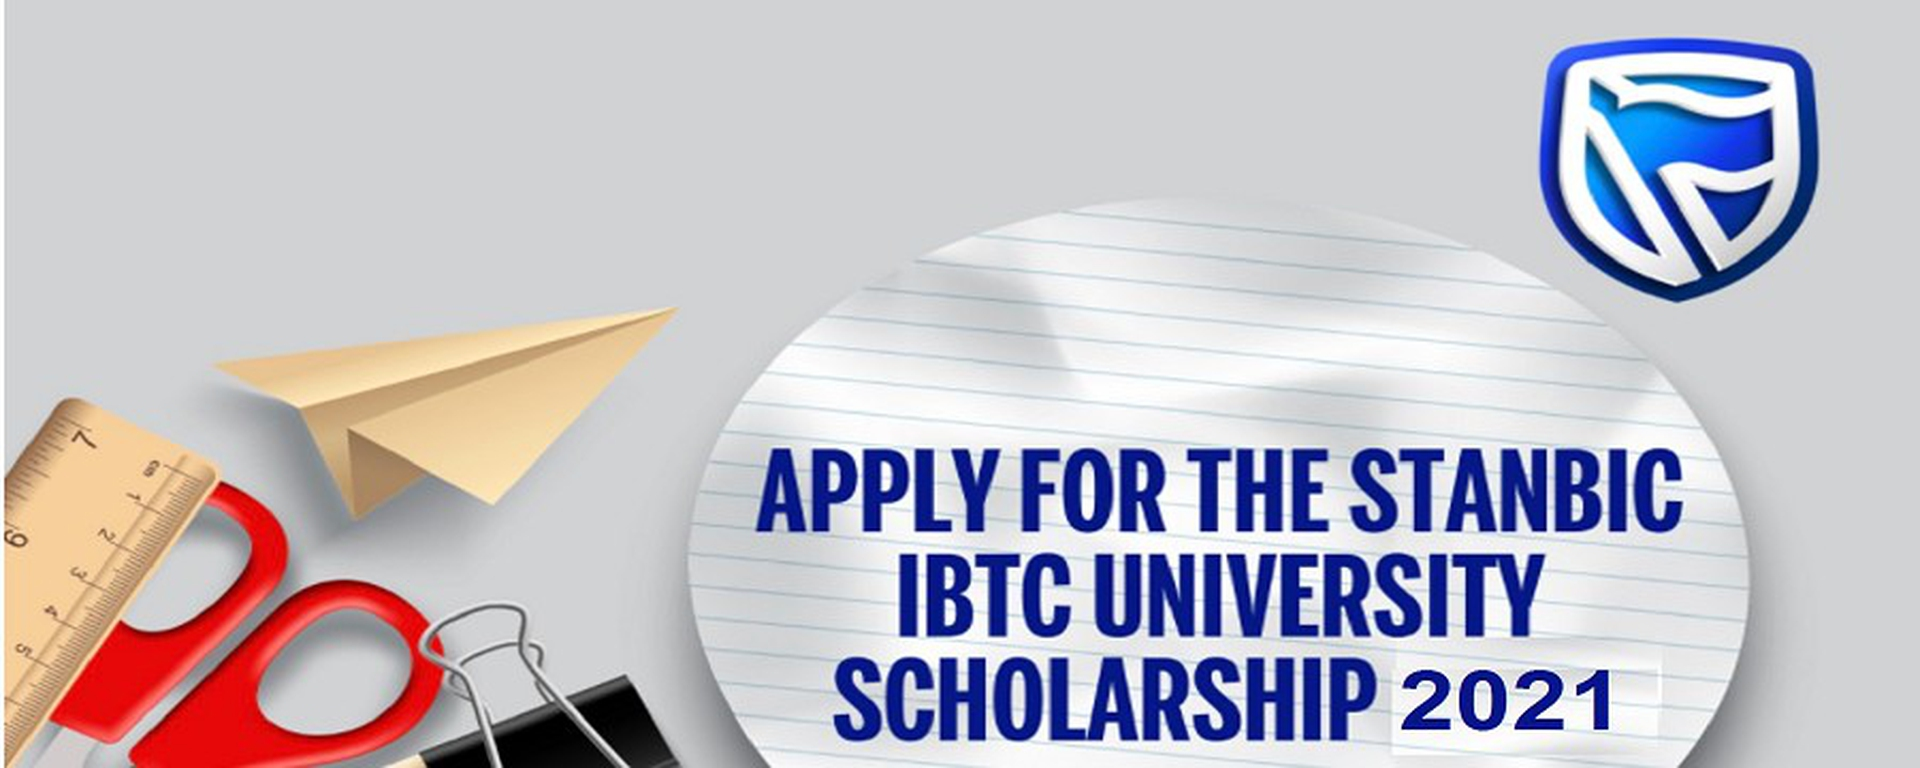 Stanbic IBTC - Stanbic IBTC University Scholarship Movemeback African initiative cover image